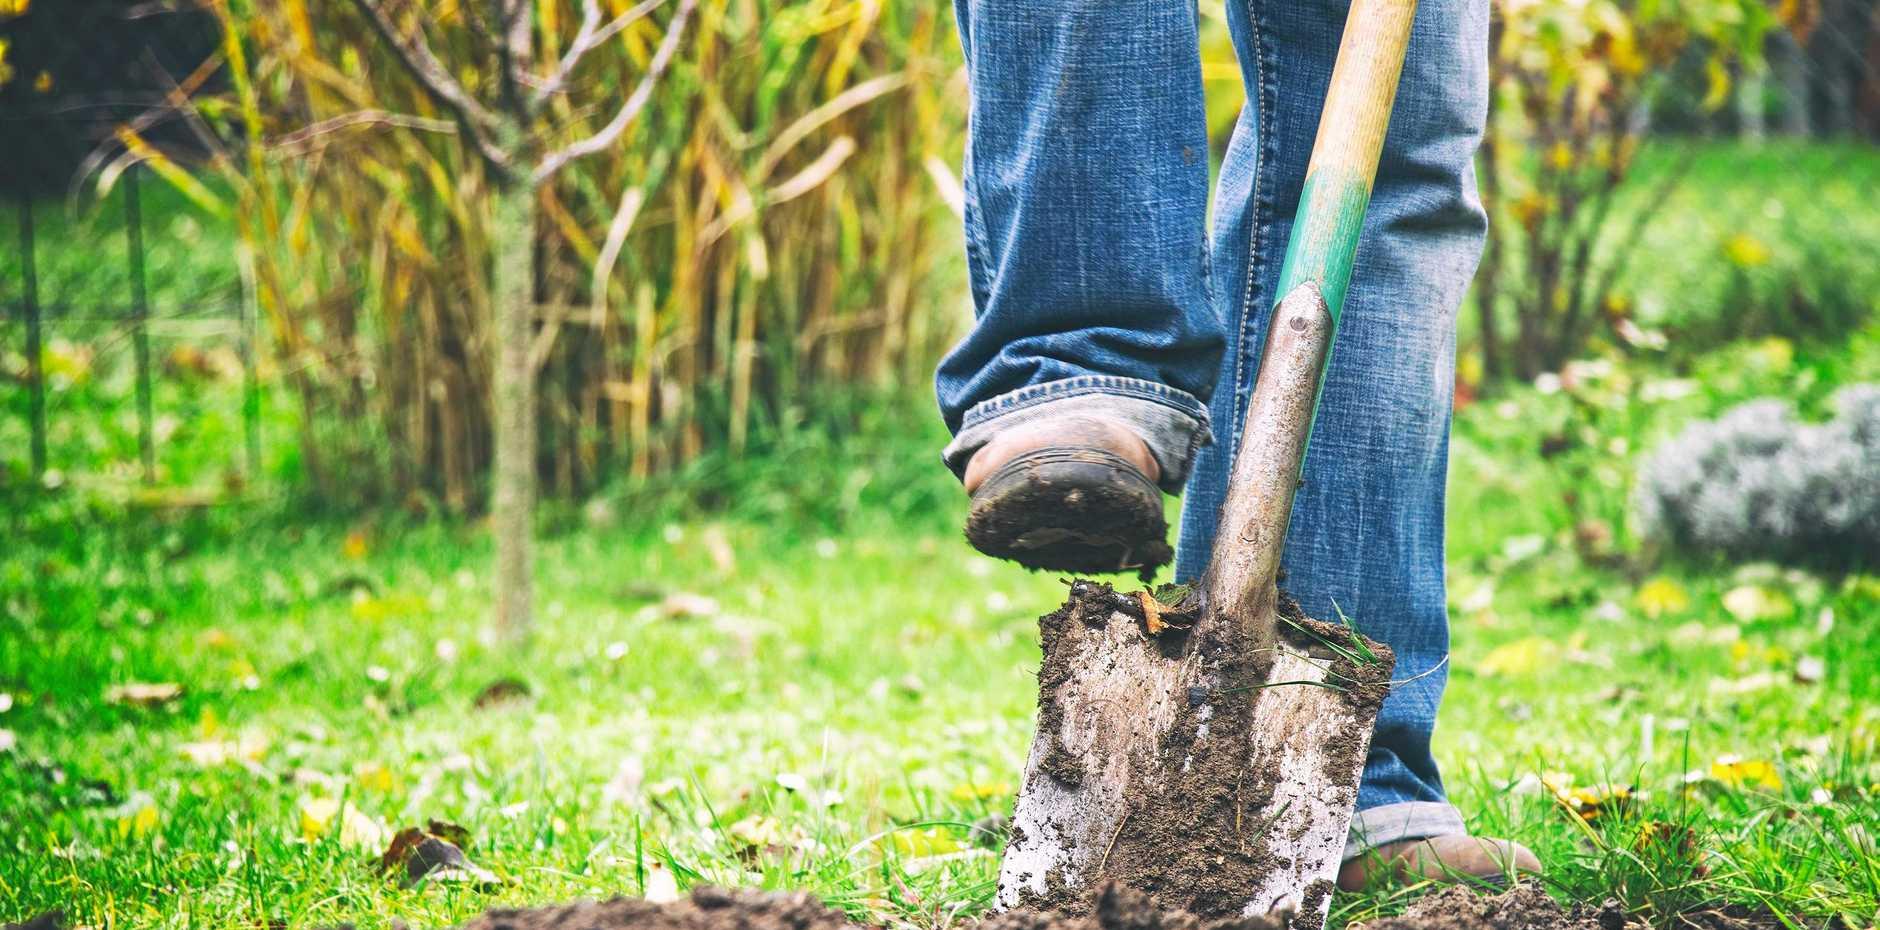 Ergon Energy urges people to take care around yard.